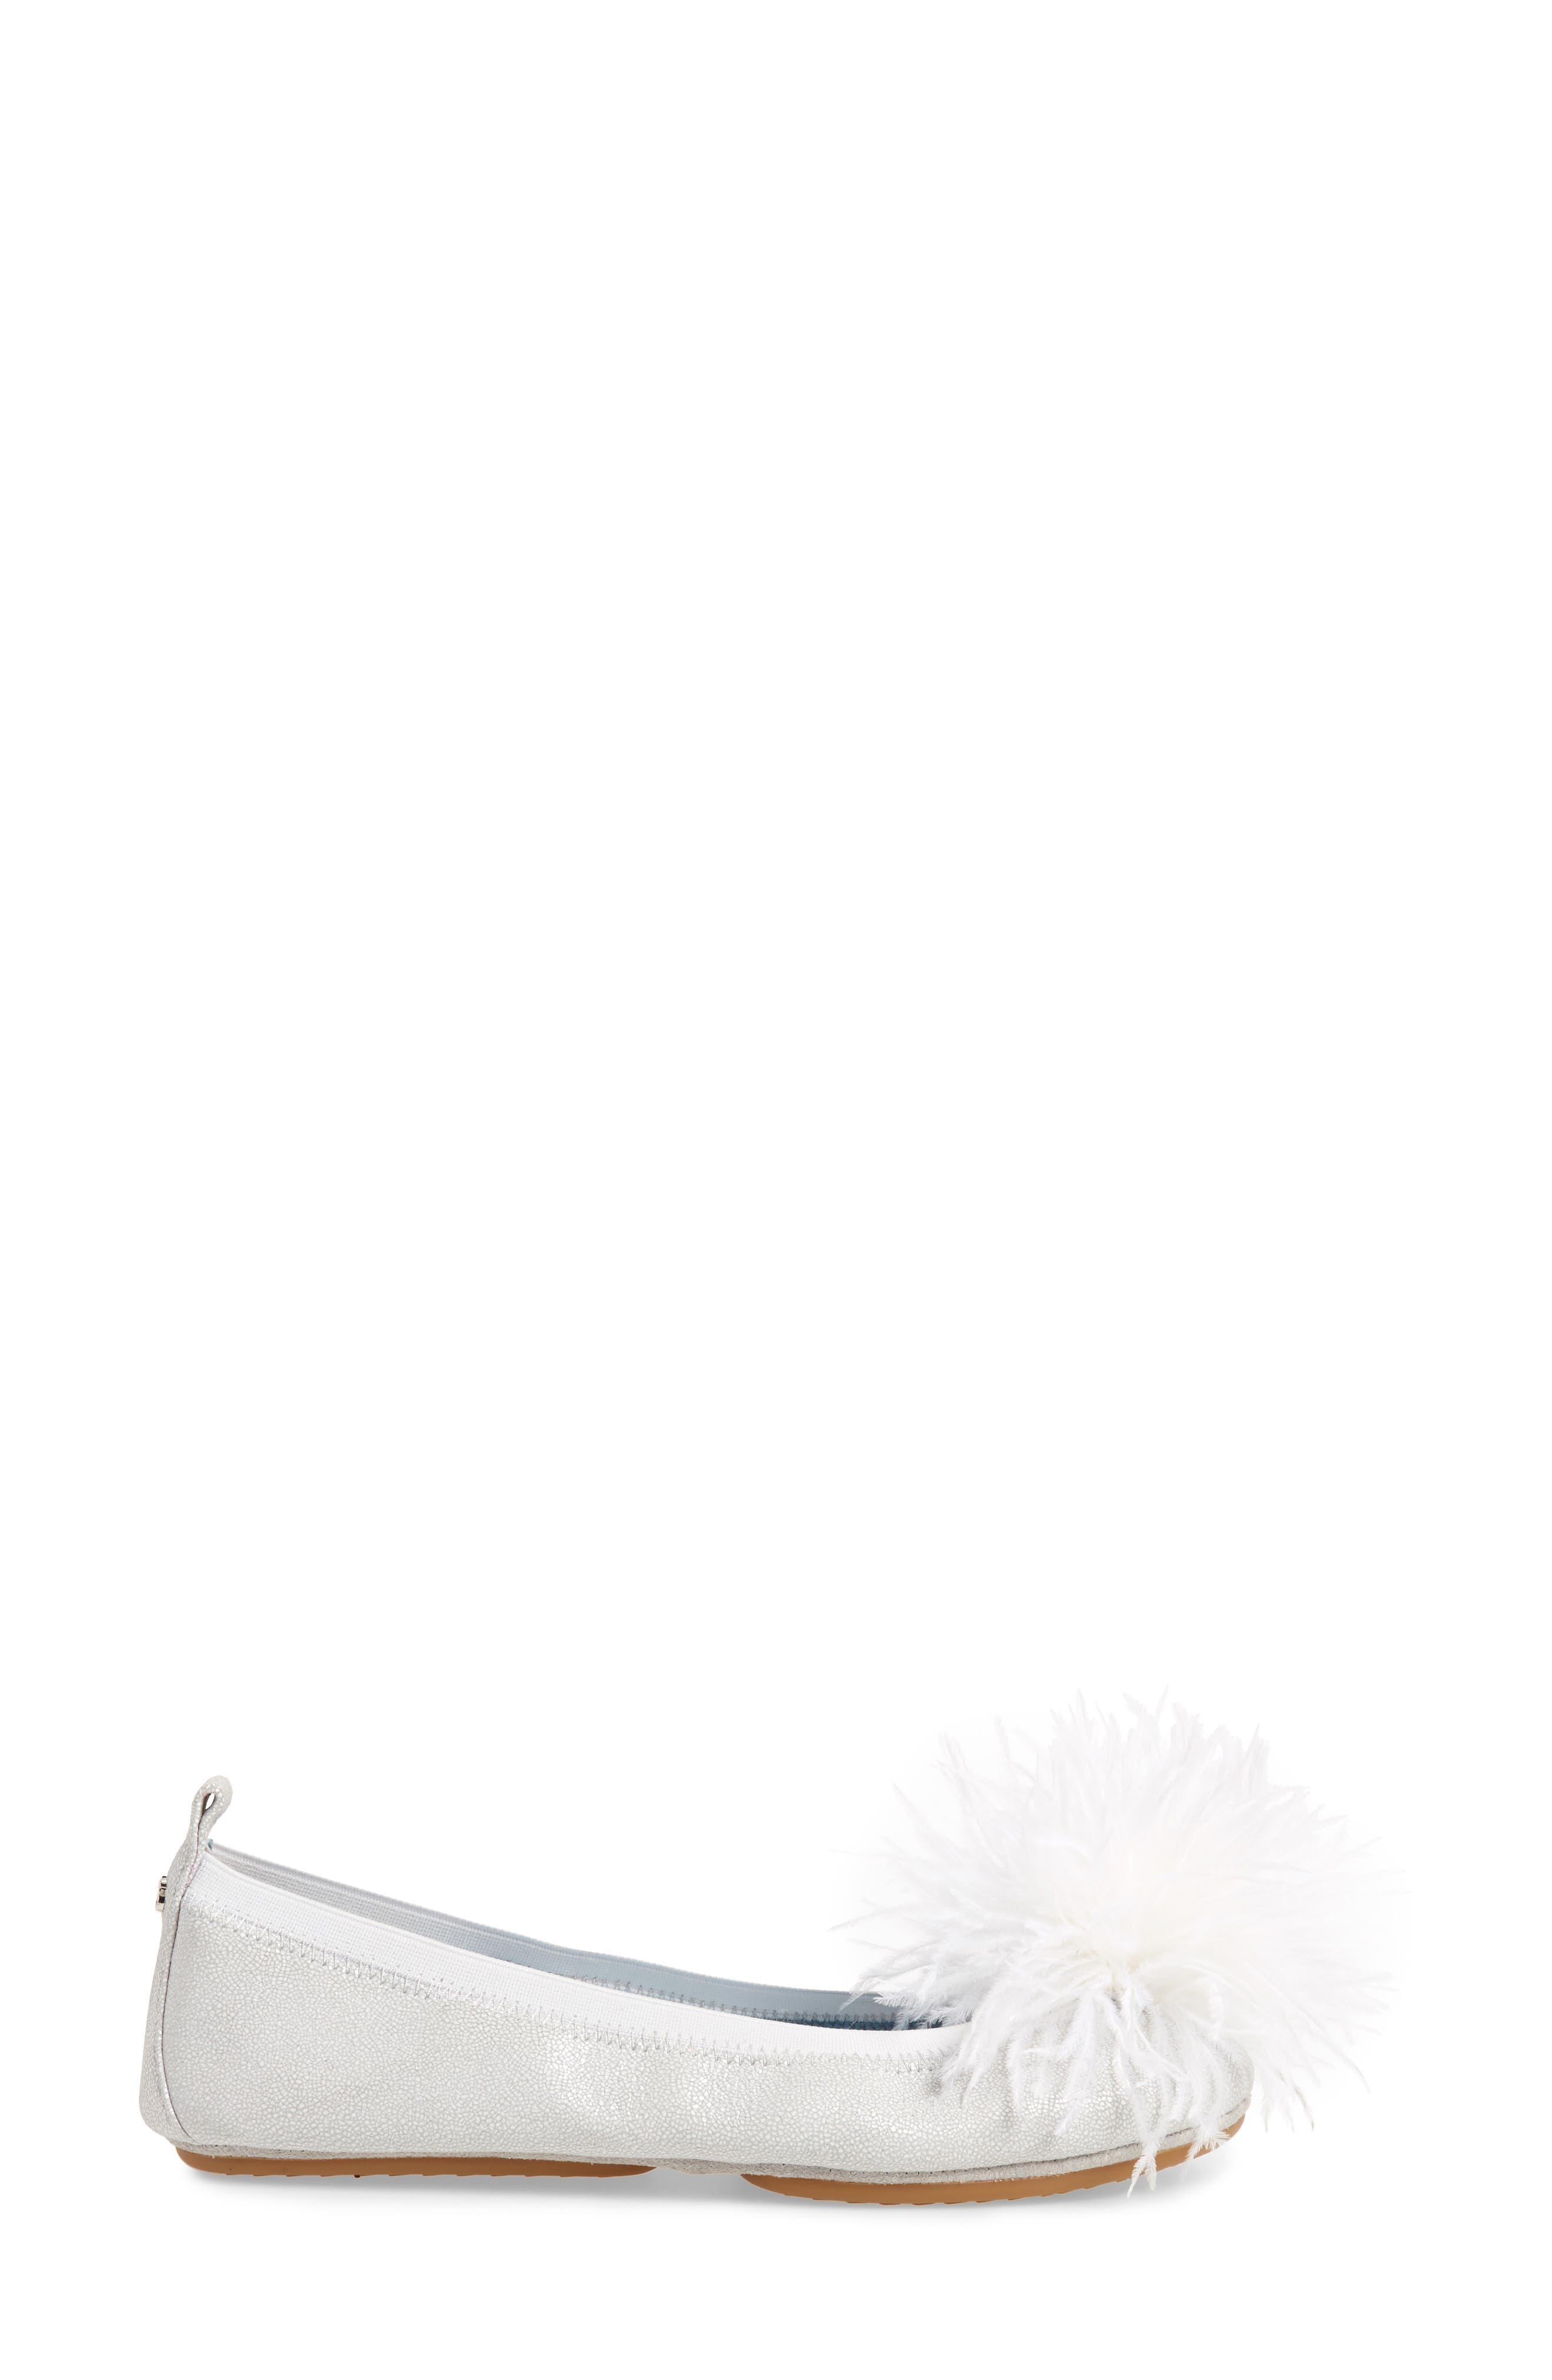 Marabou Feather Pompom Flat,                             Alternate thumbnail 3, color,                             040